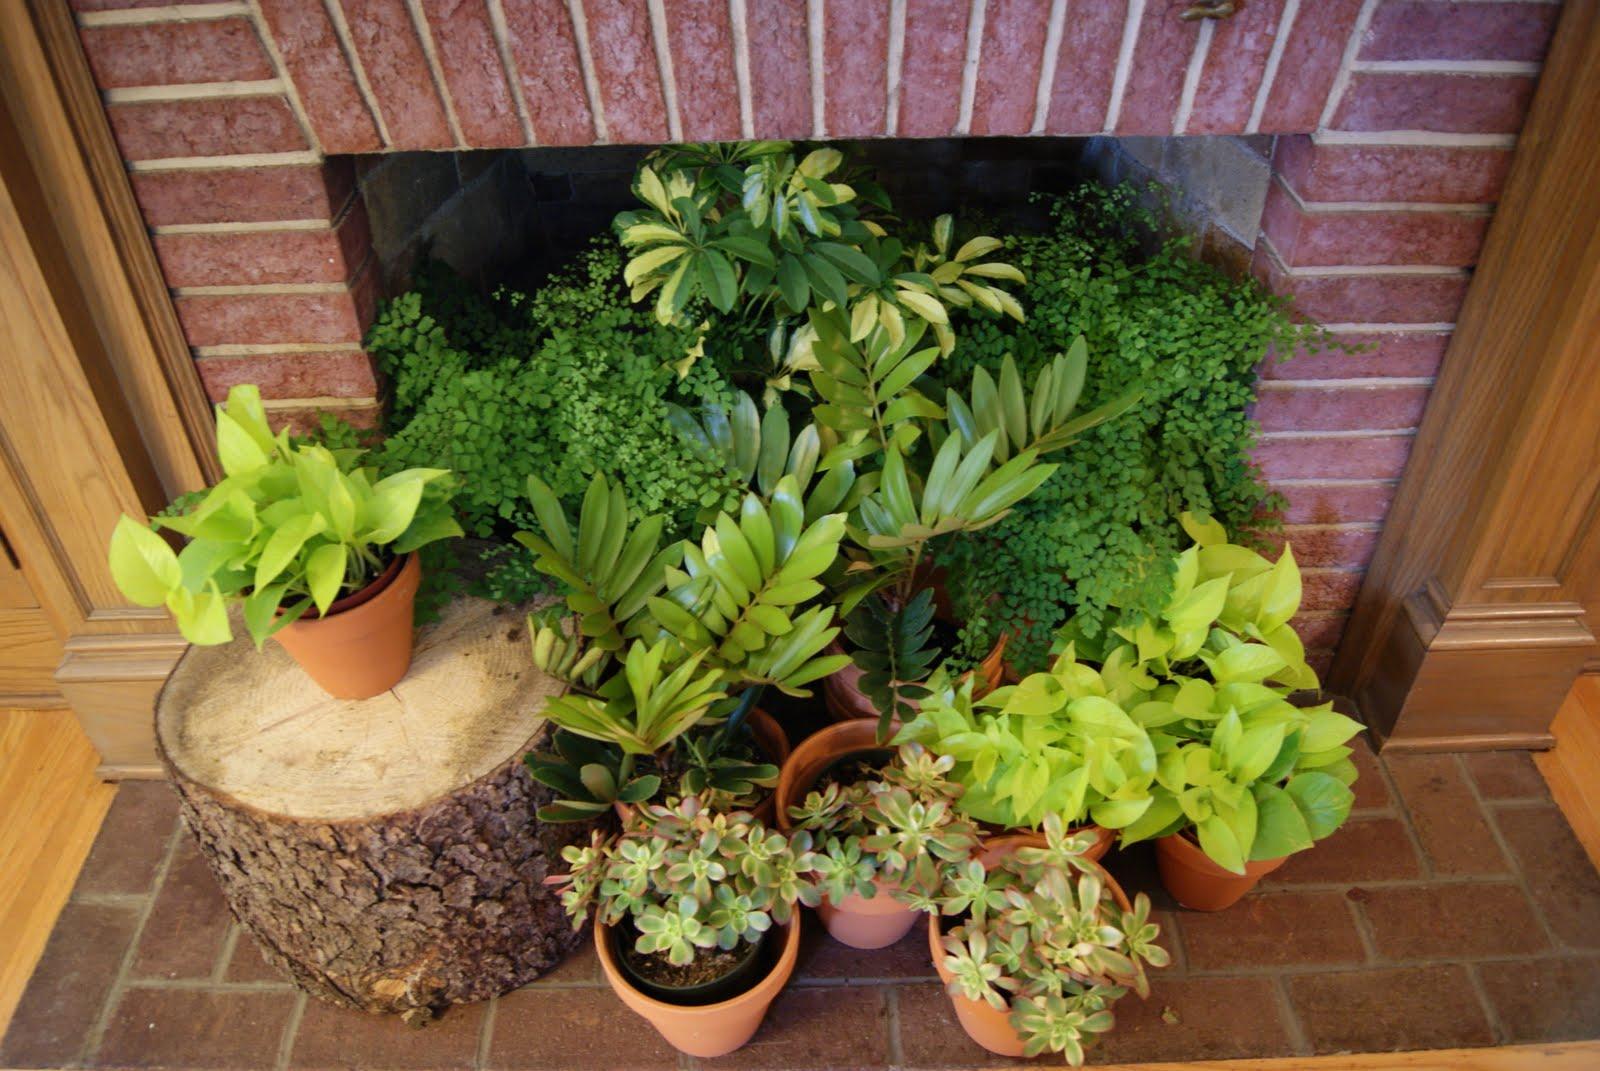 Nest full of eggs summer 11 ideas house - Indoor plants decoration ideas ...